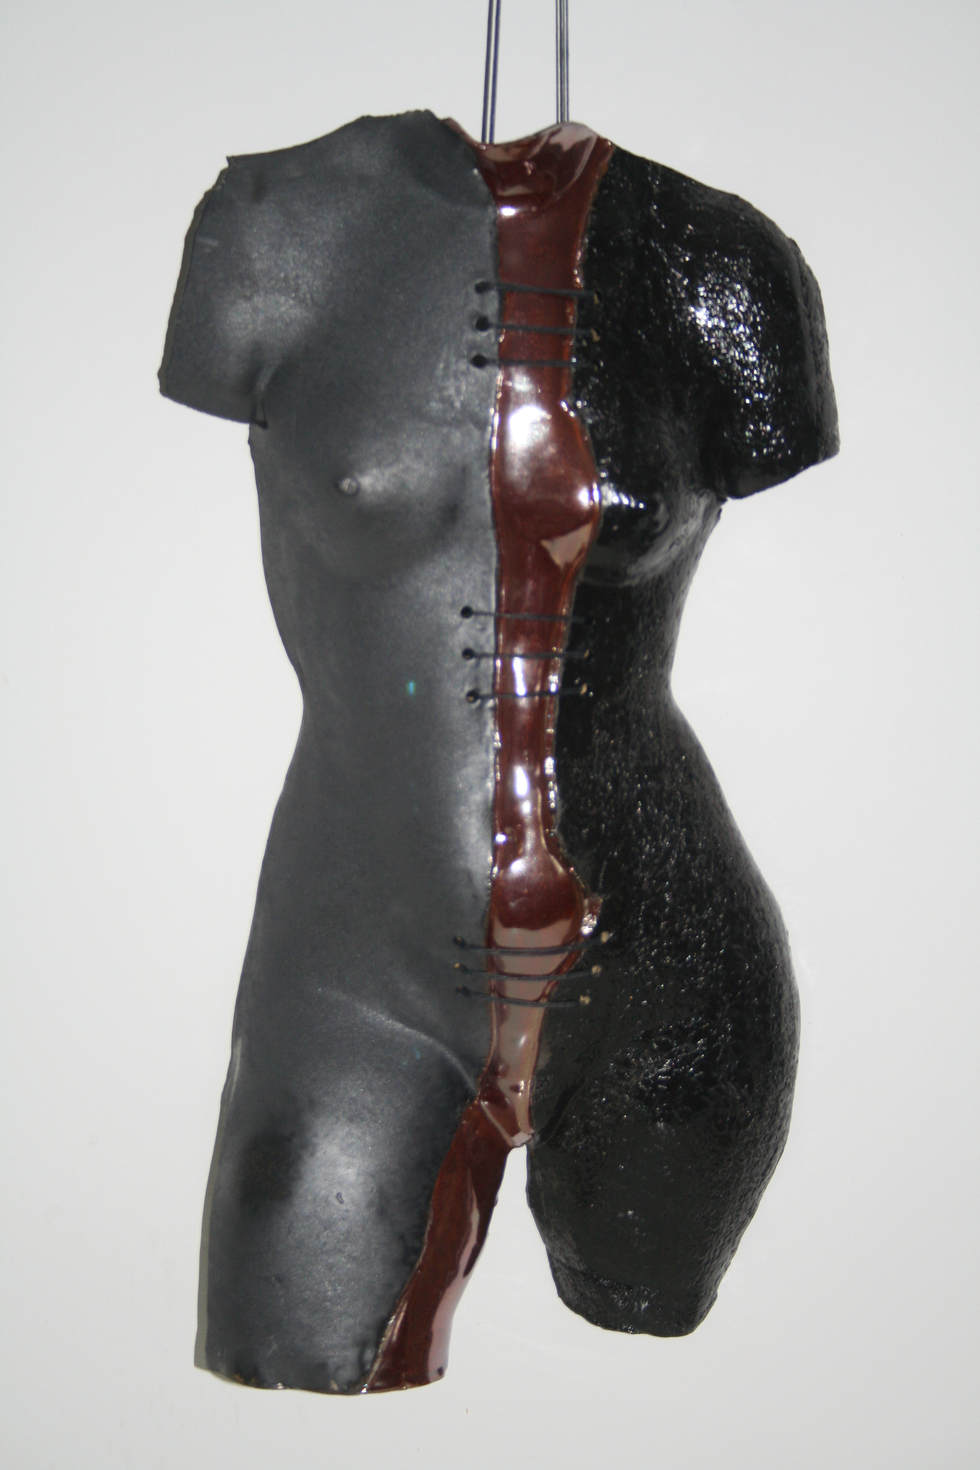 Body (especially made for Dubai)